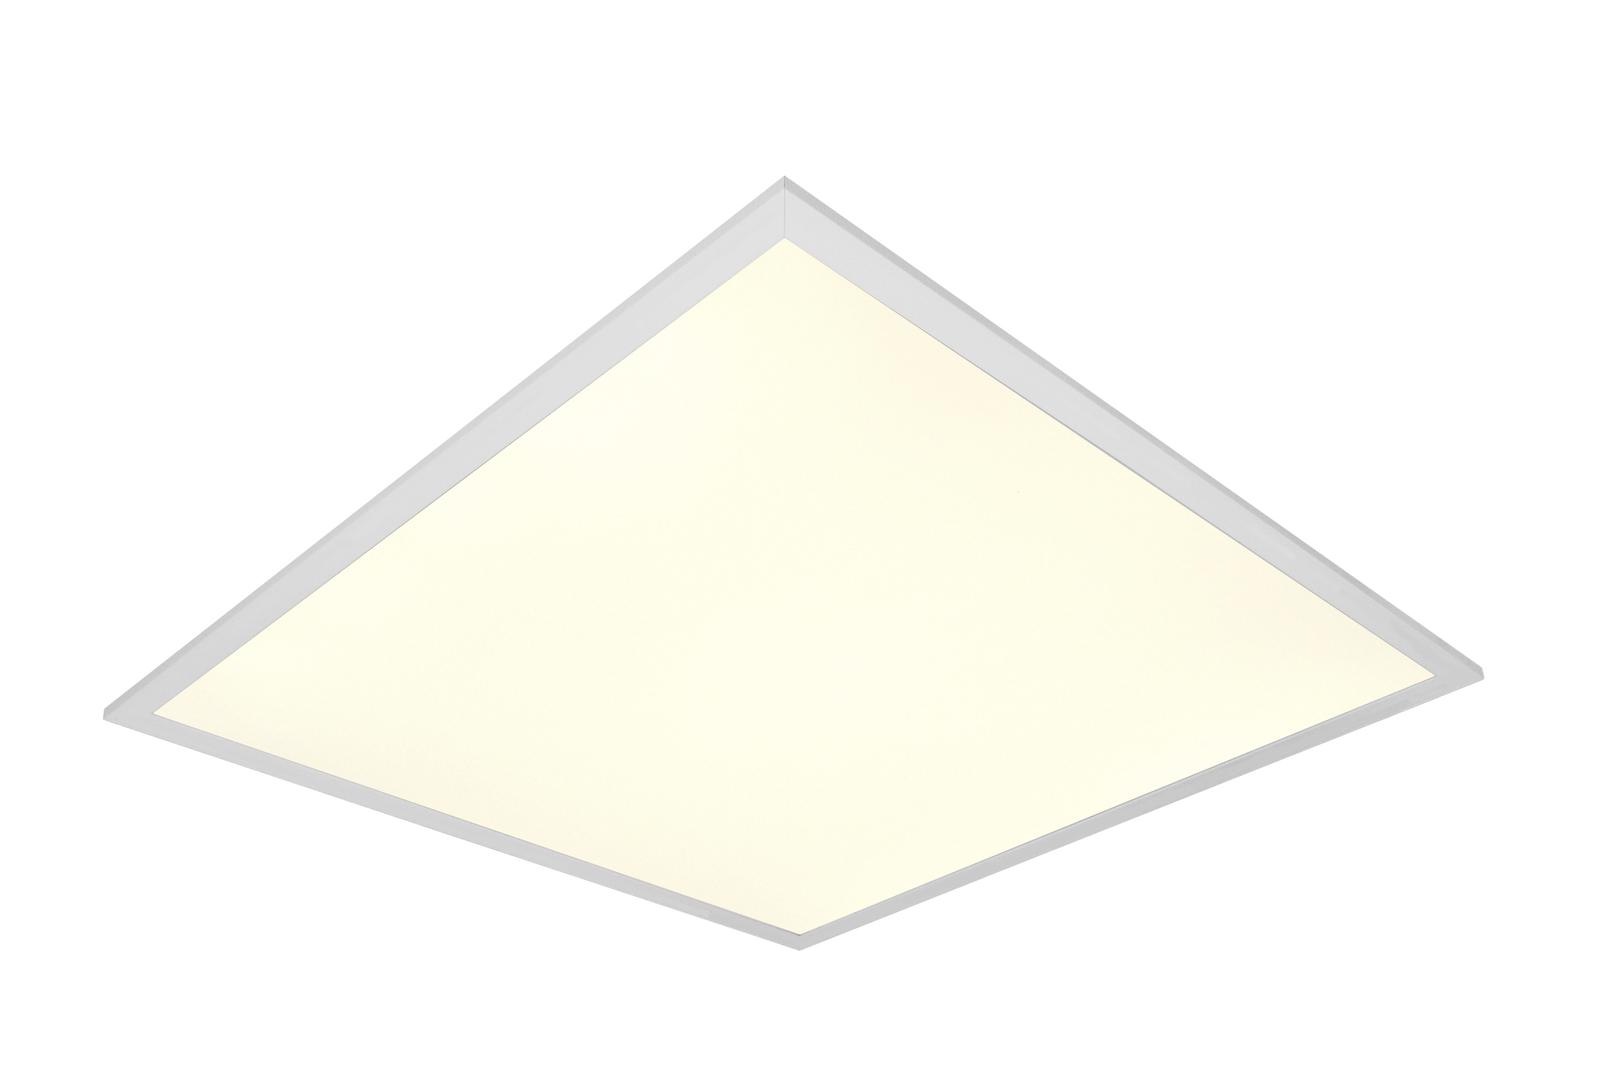 Panel LED biały kwadrat 40W 230V IP20 4000K